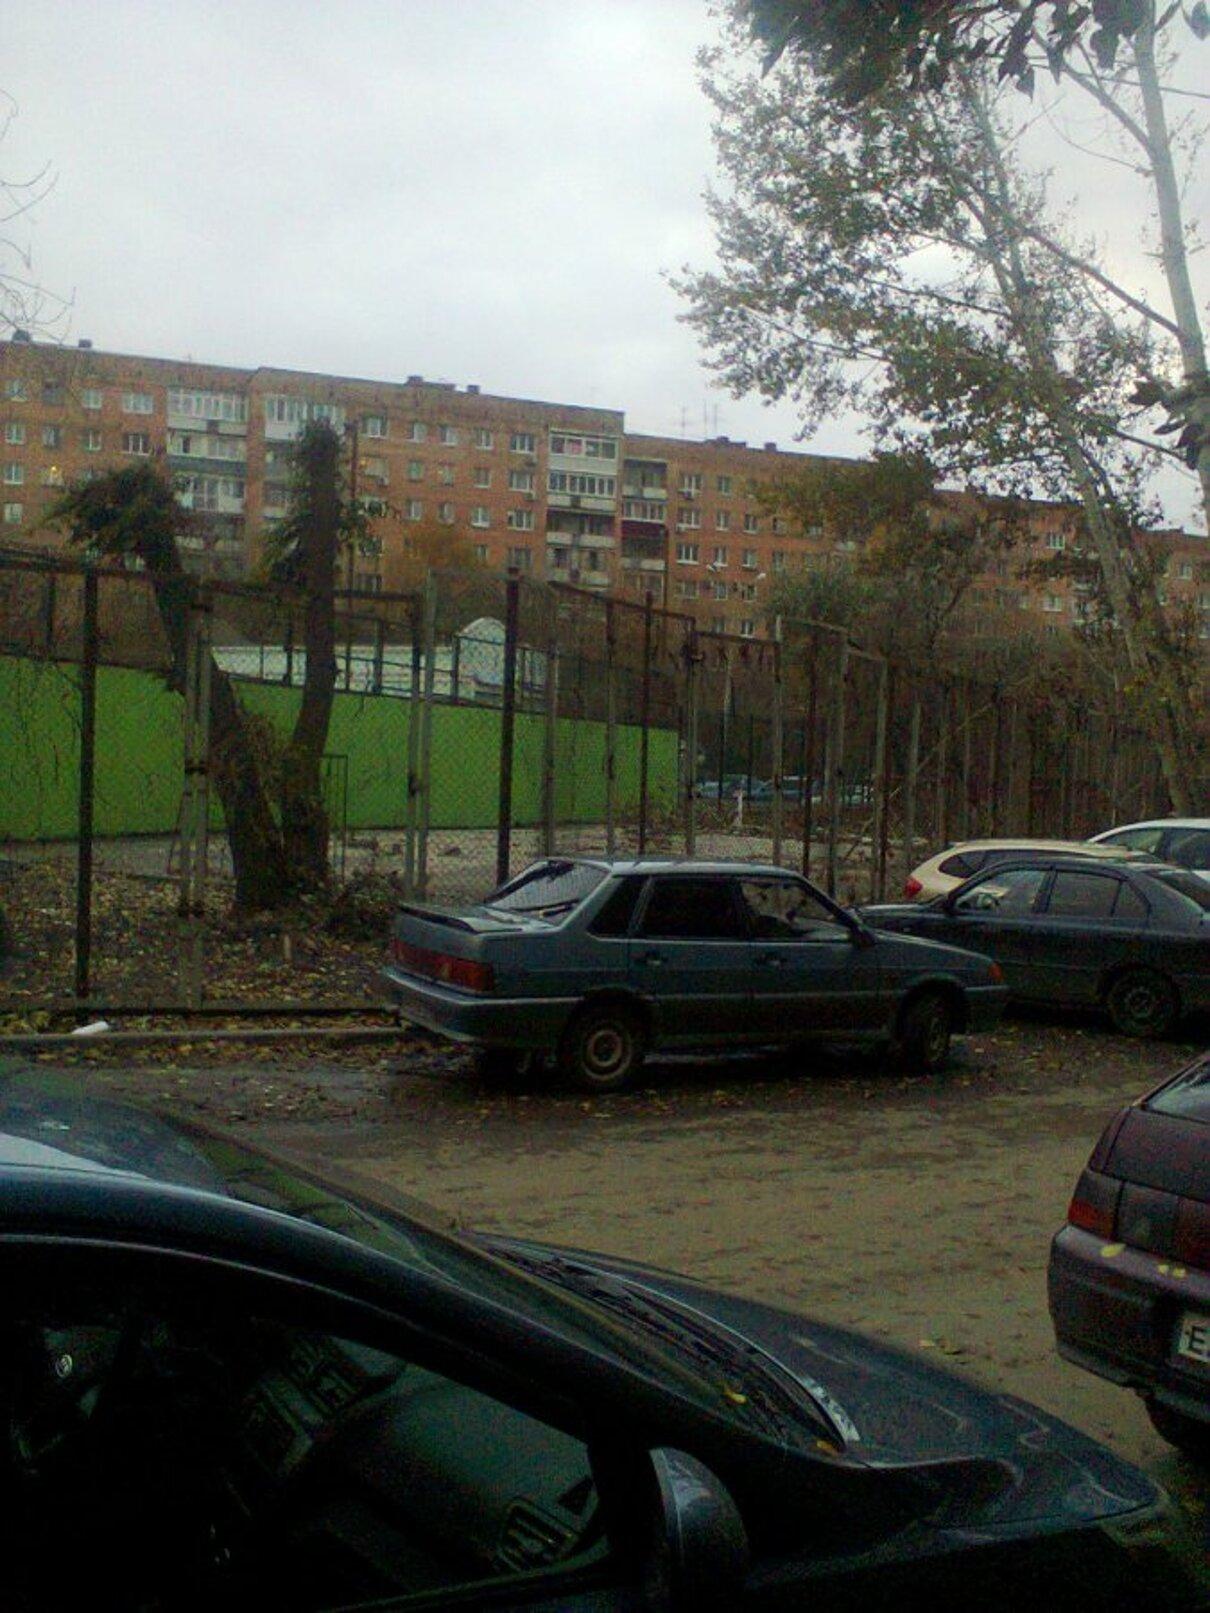 Жалоба-отзыв: ДЮСШ №1 Самара - Ползучий захват общественной земли в Самаре.  Фото №2